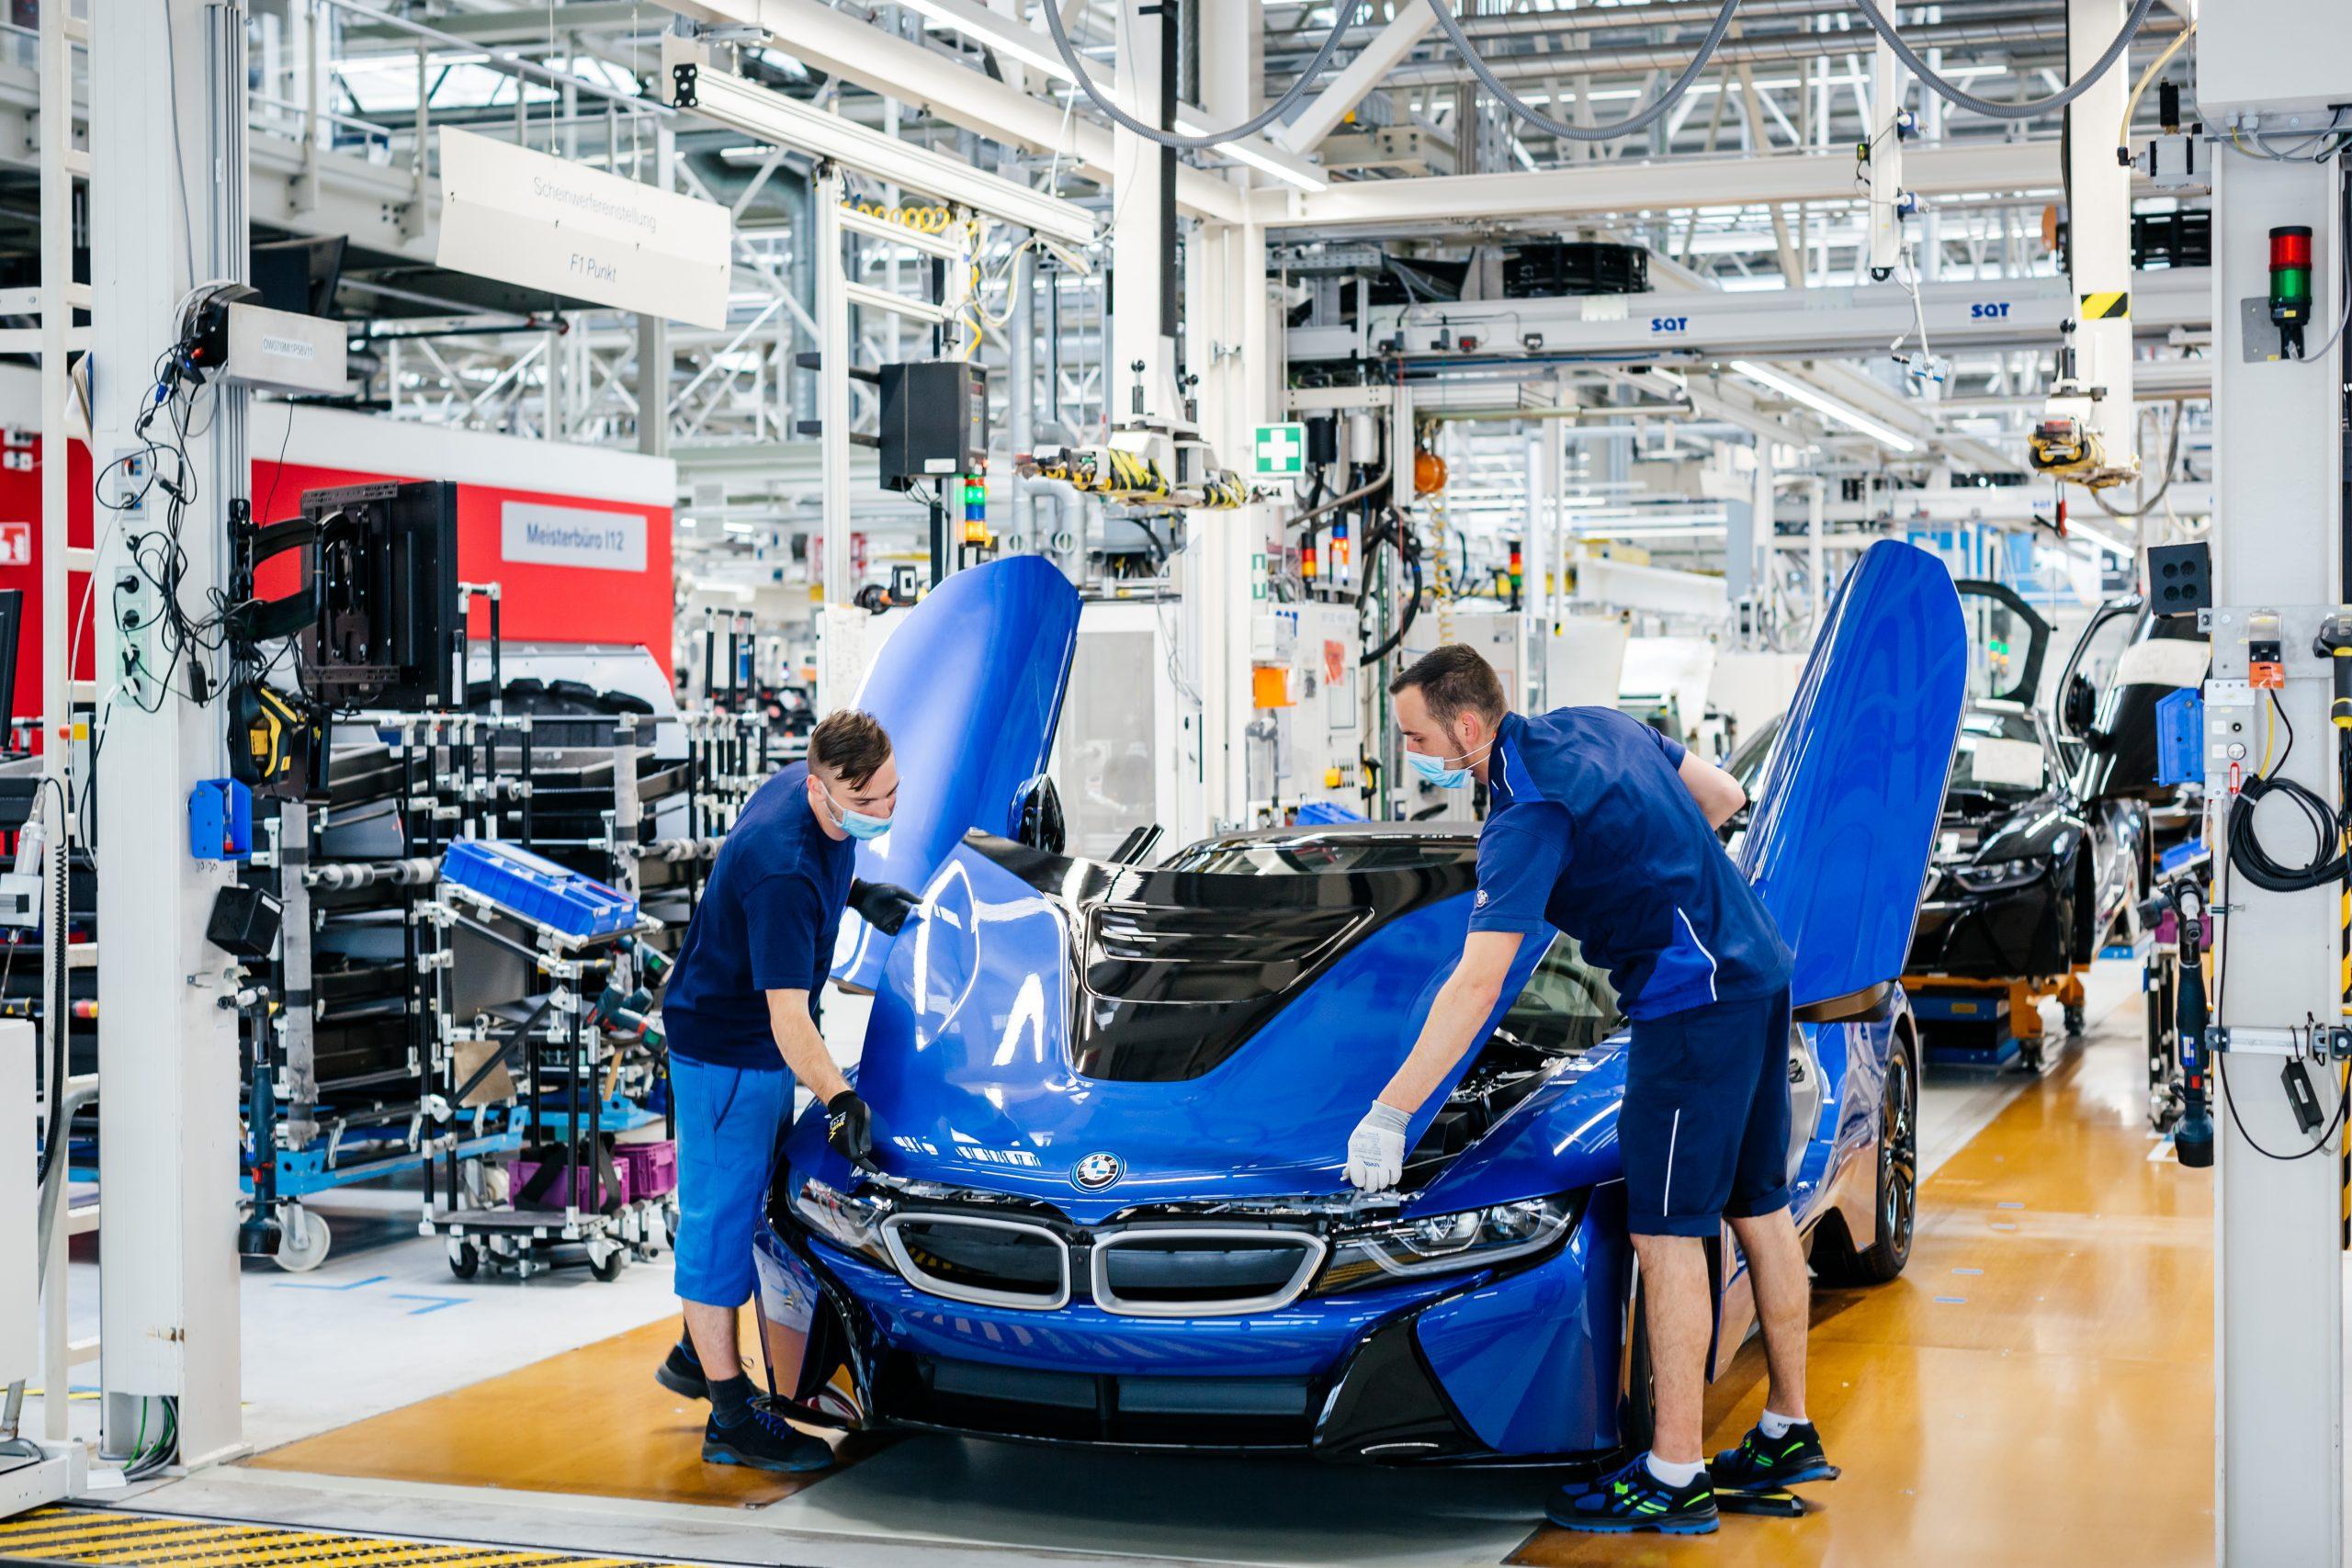 BMW i8 final 18 -factory 9